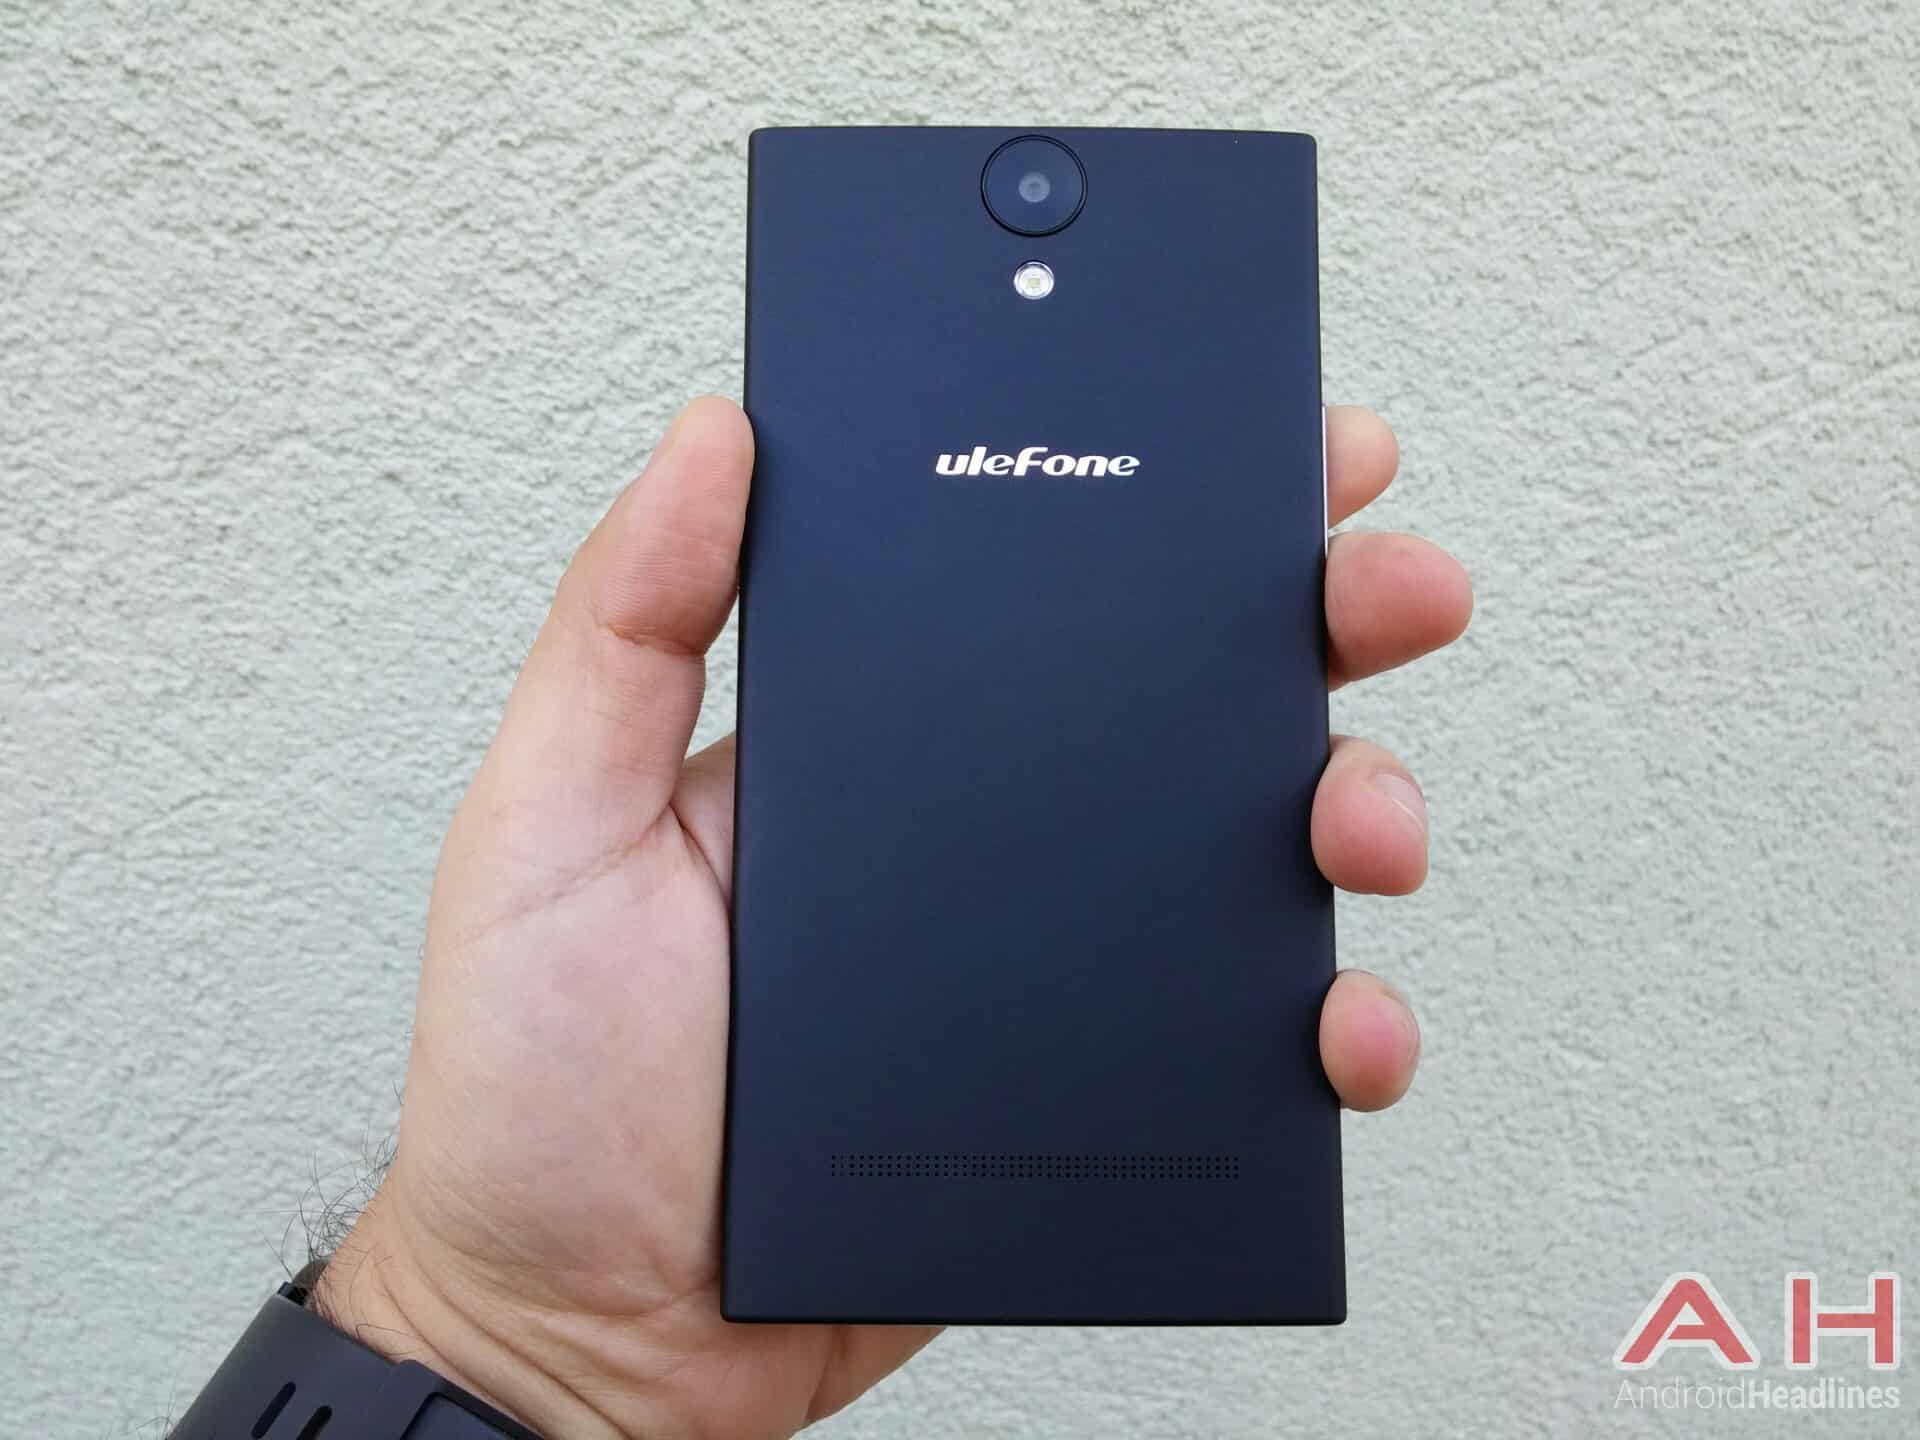 AH Ulefone Be One Hardware 2